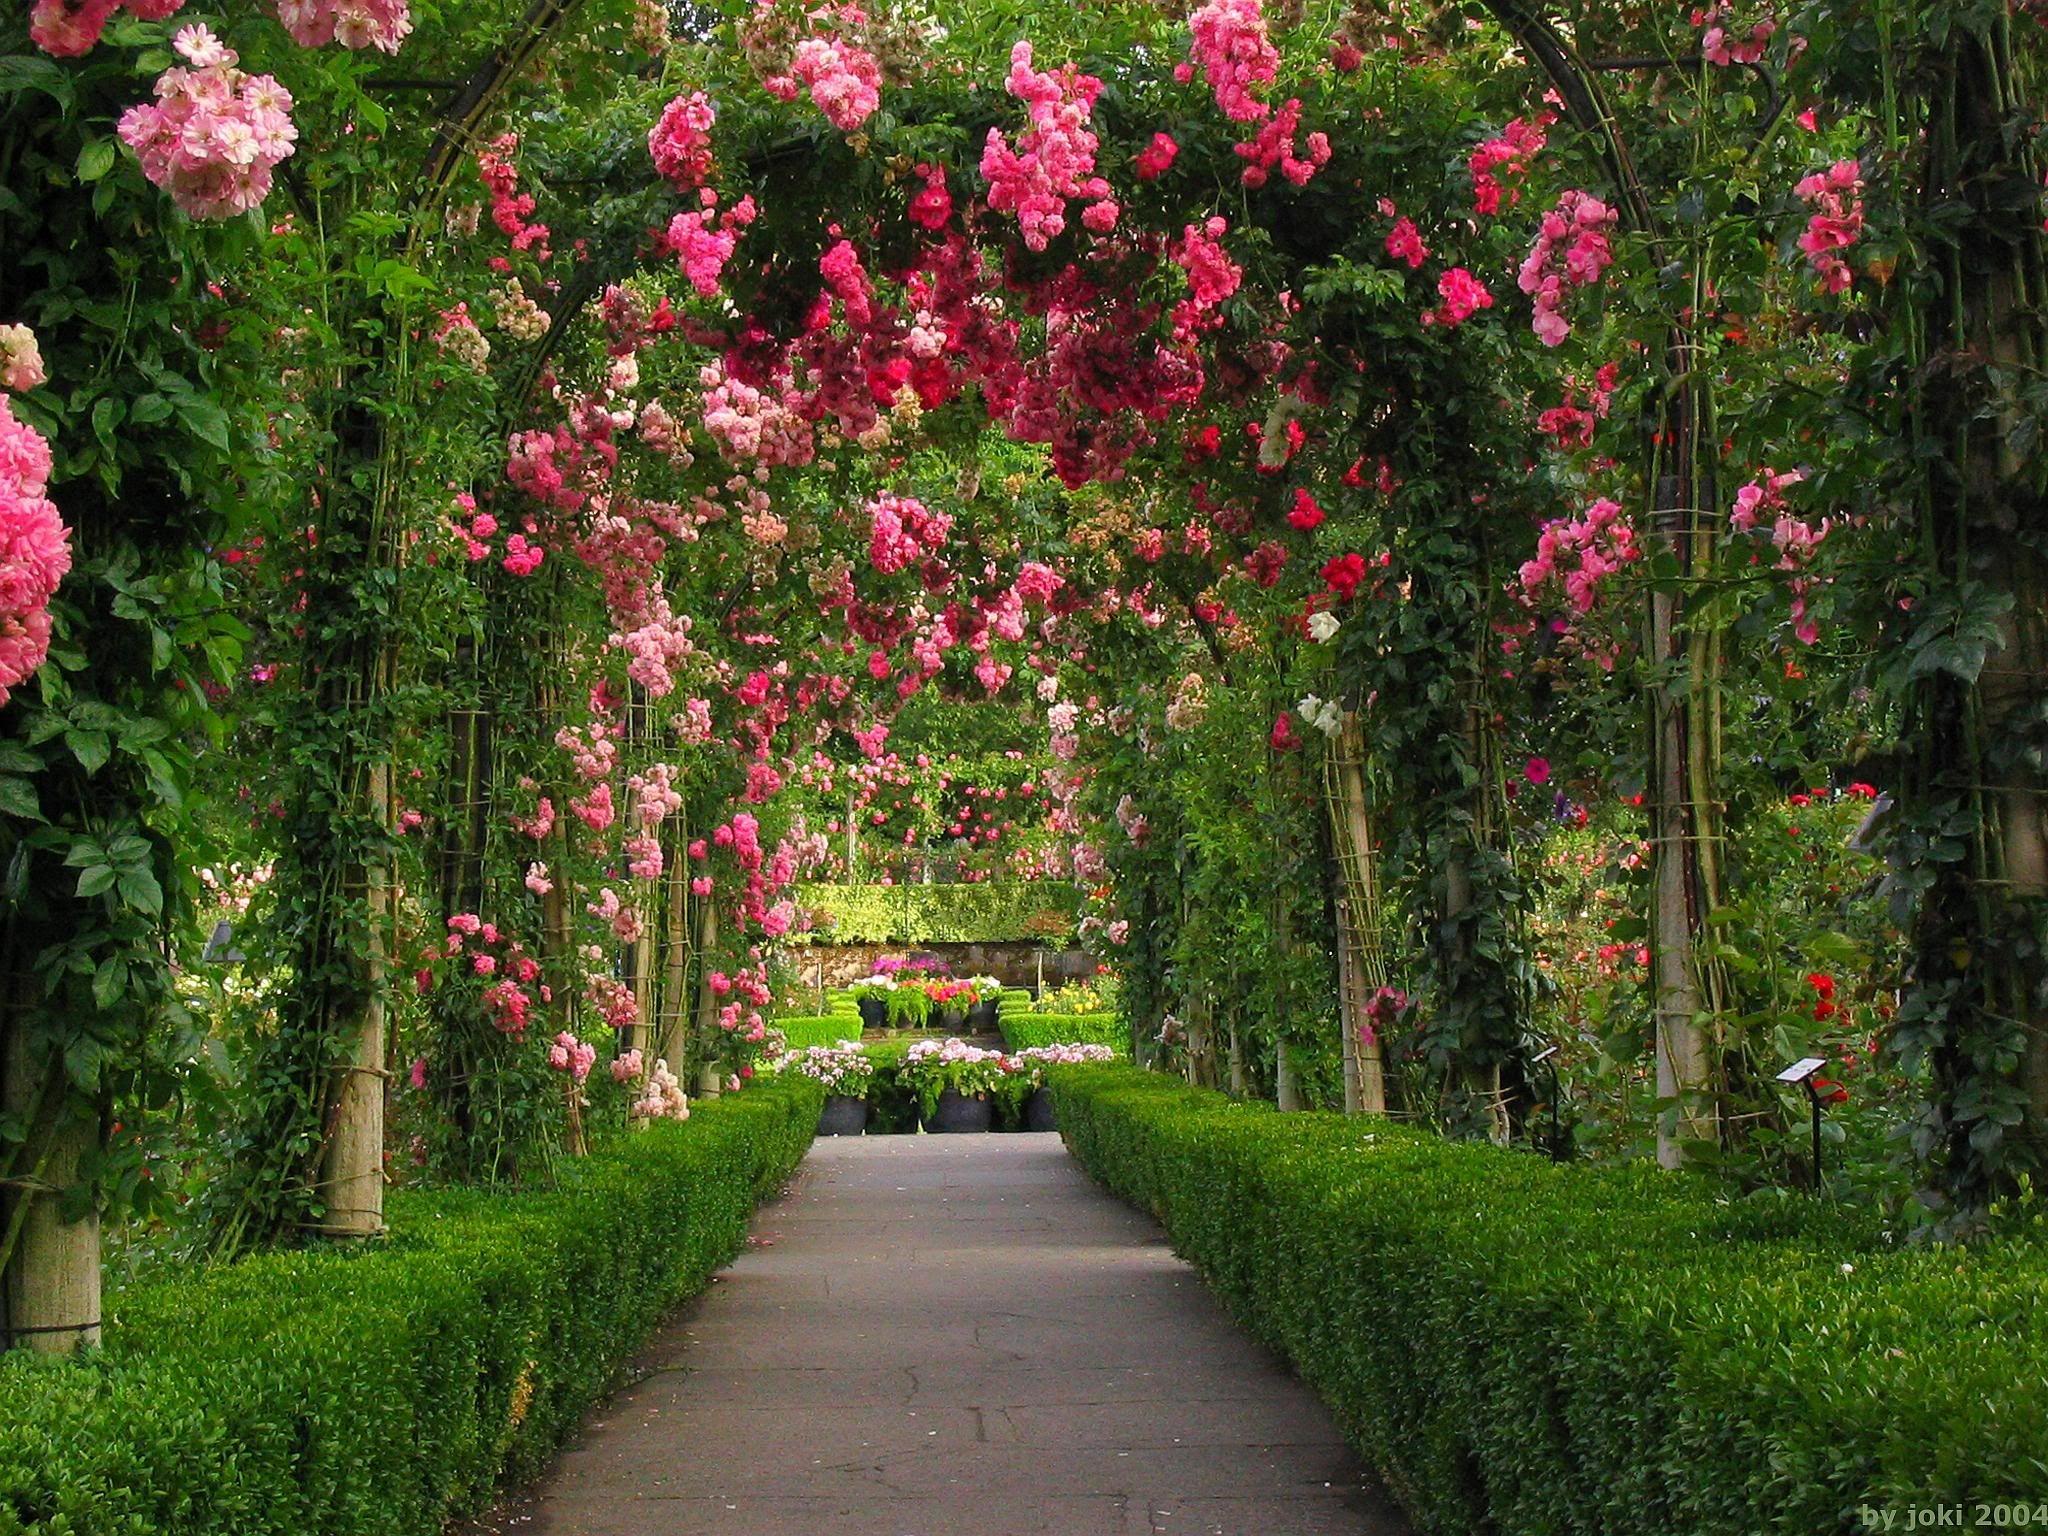 Beautiful Rose Garden Wallpaper Gallery Free Wallpaper